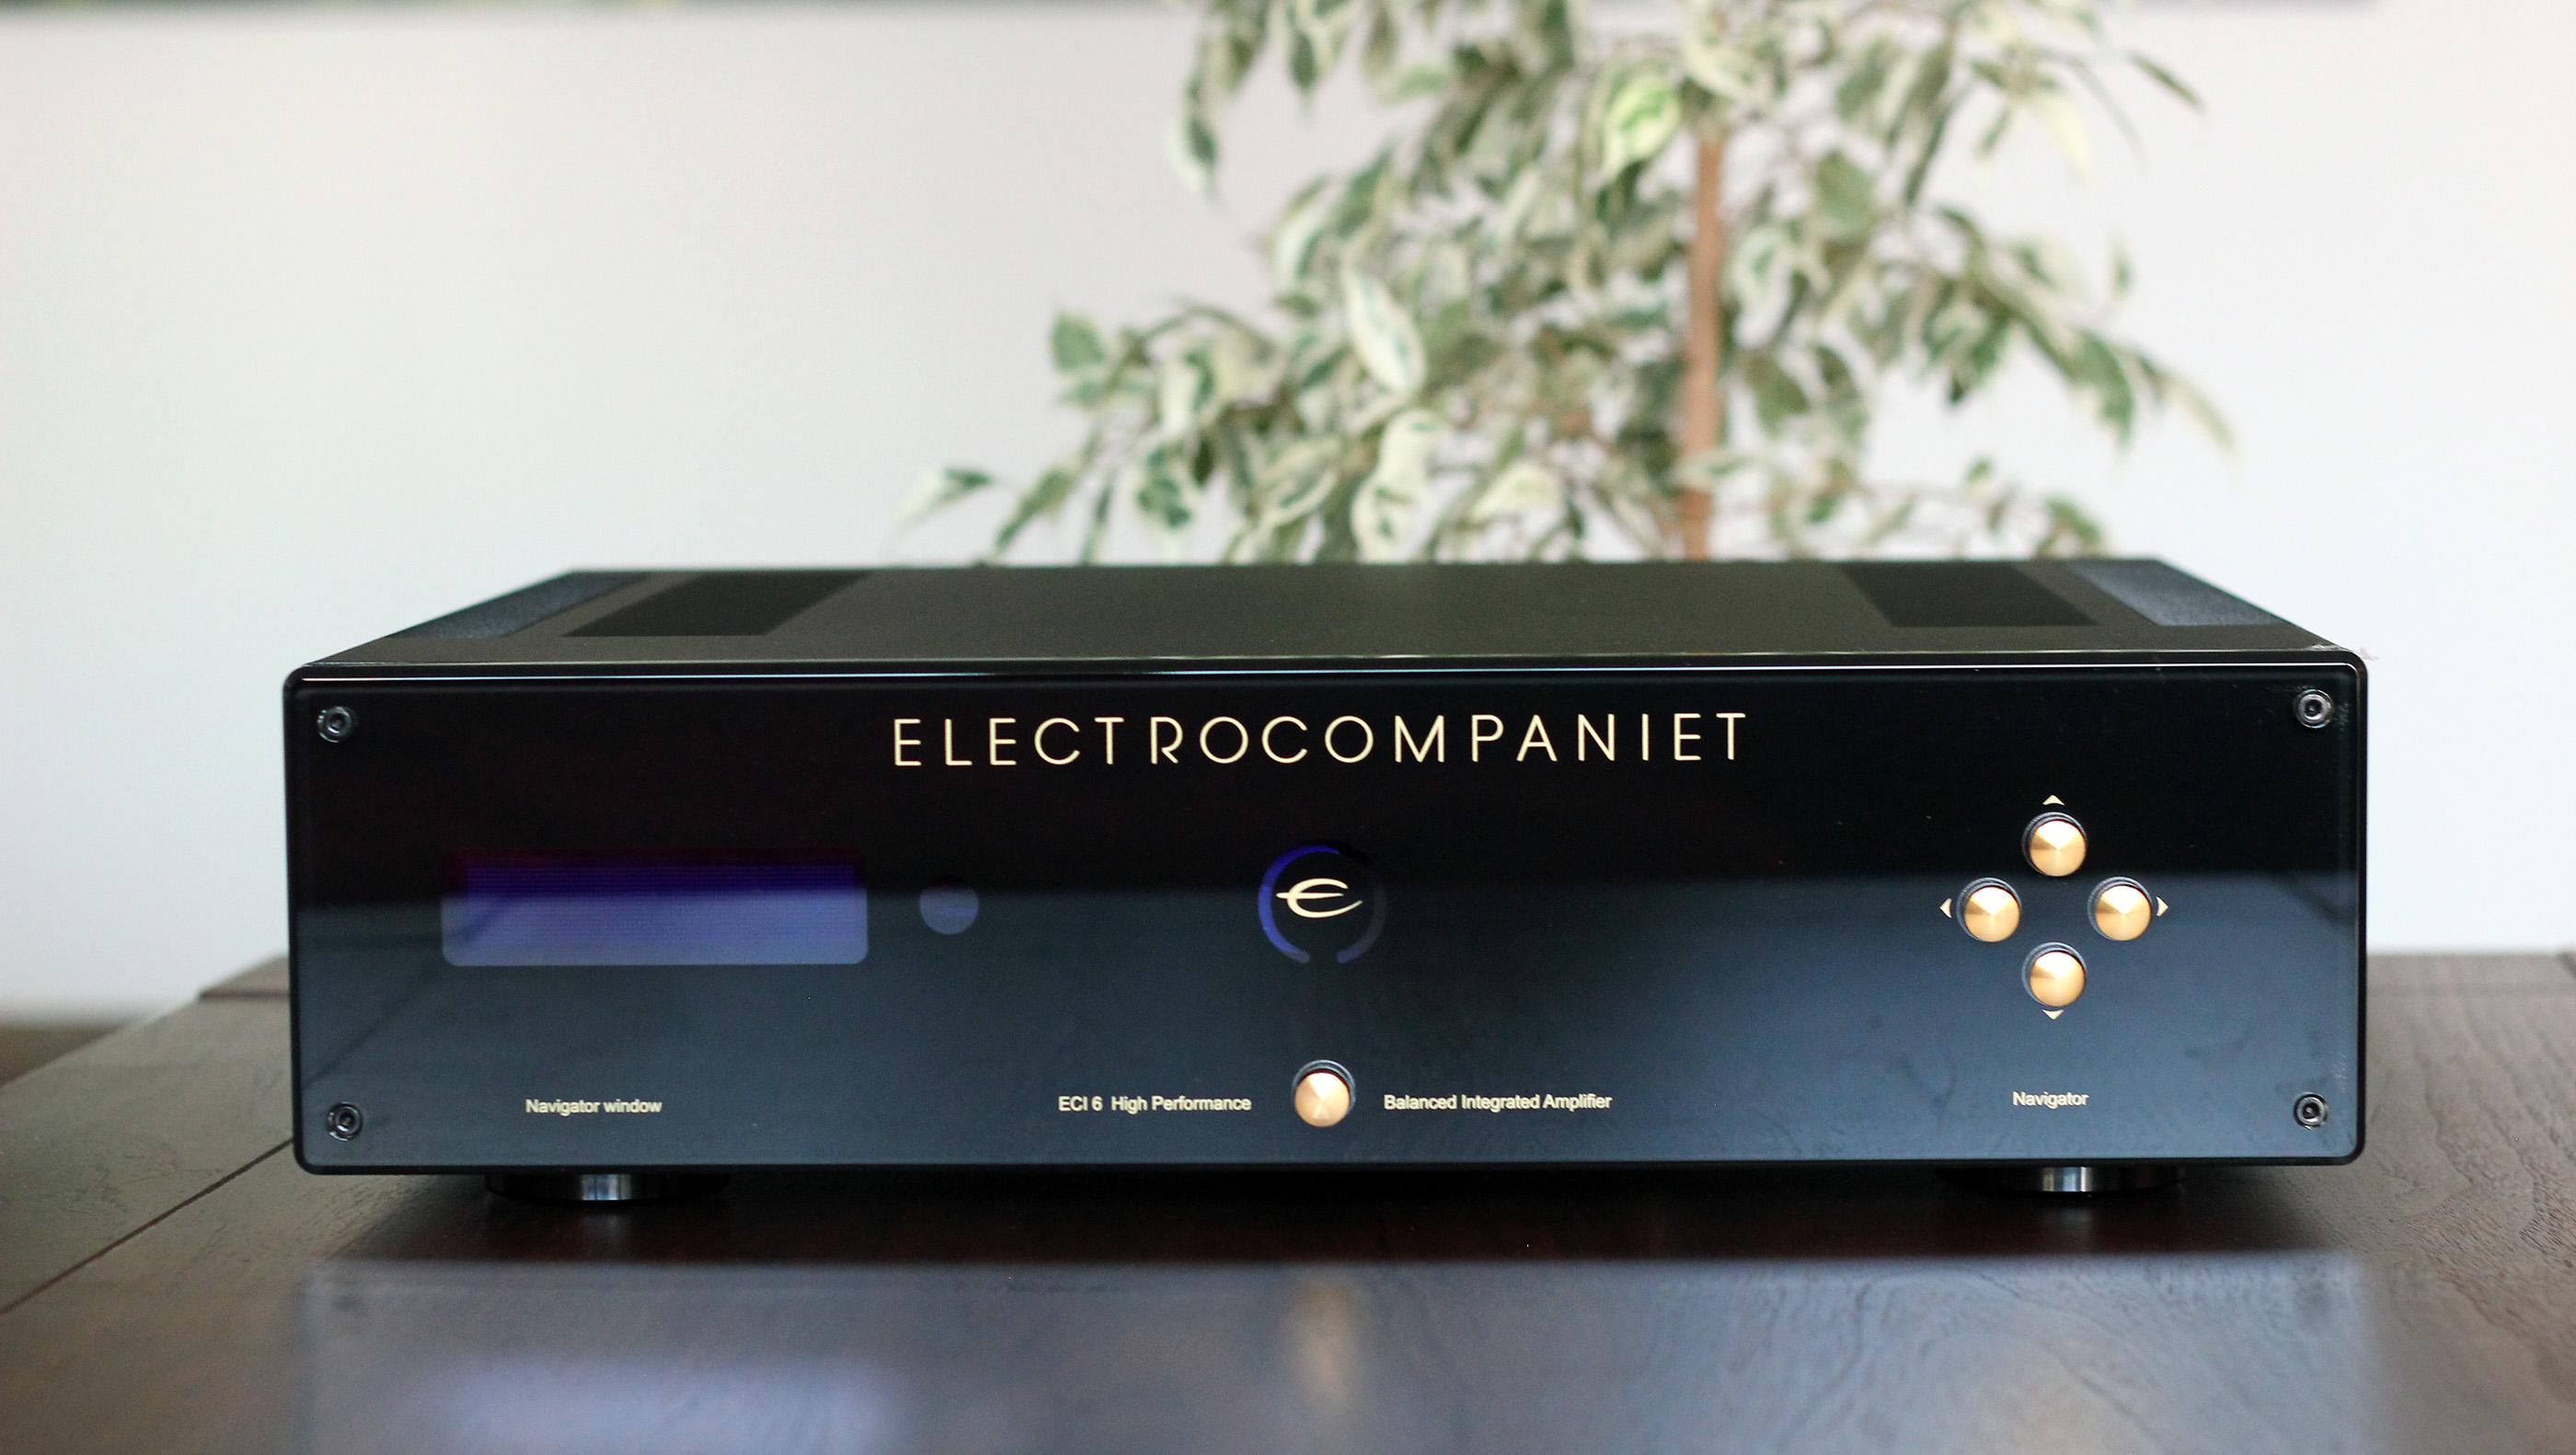 Electrocompaniet ECI-6 Integrated Speaker Amplifier – Review | HeadMania